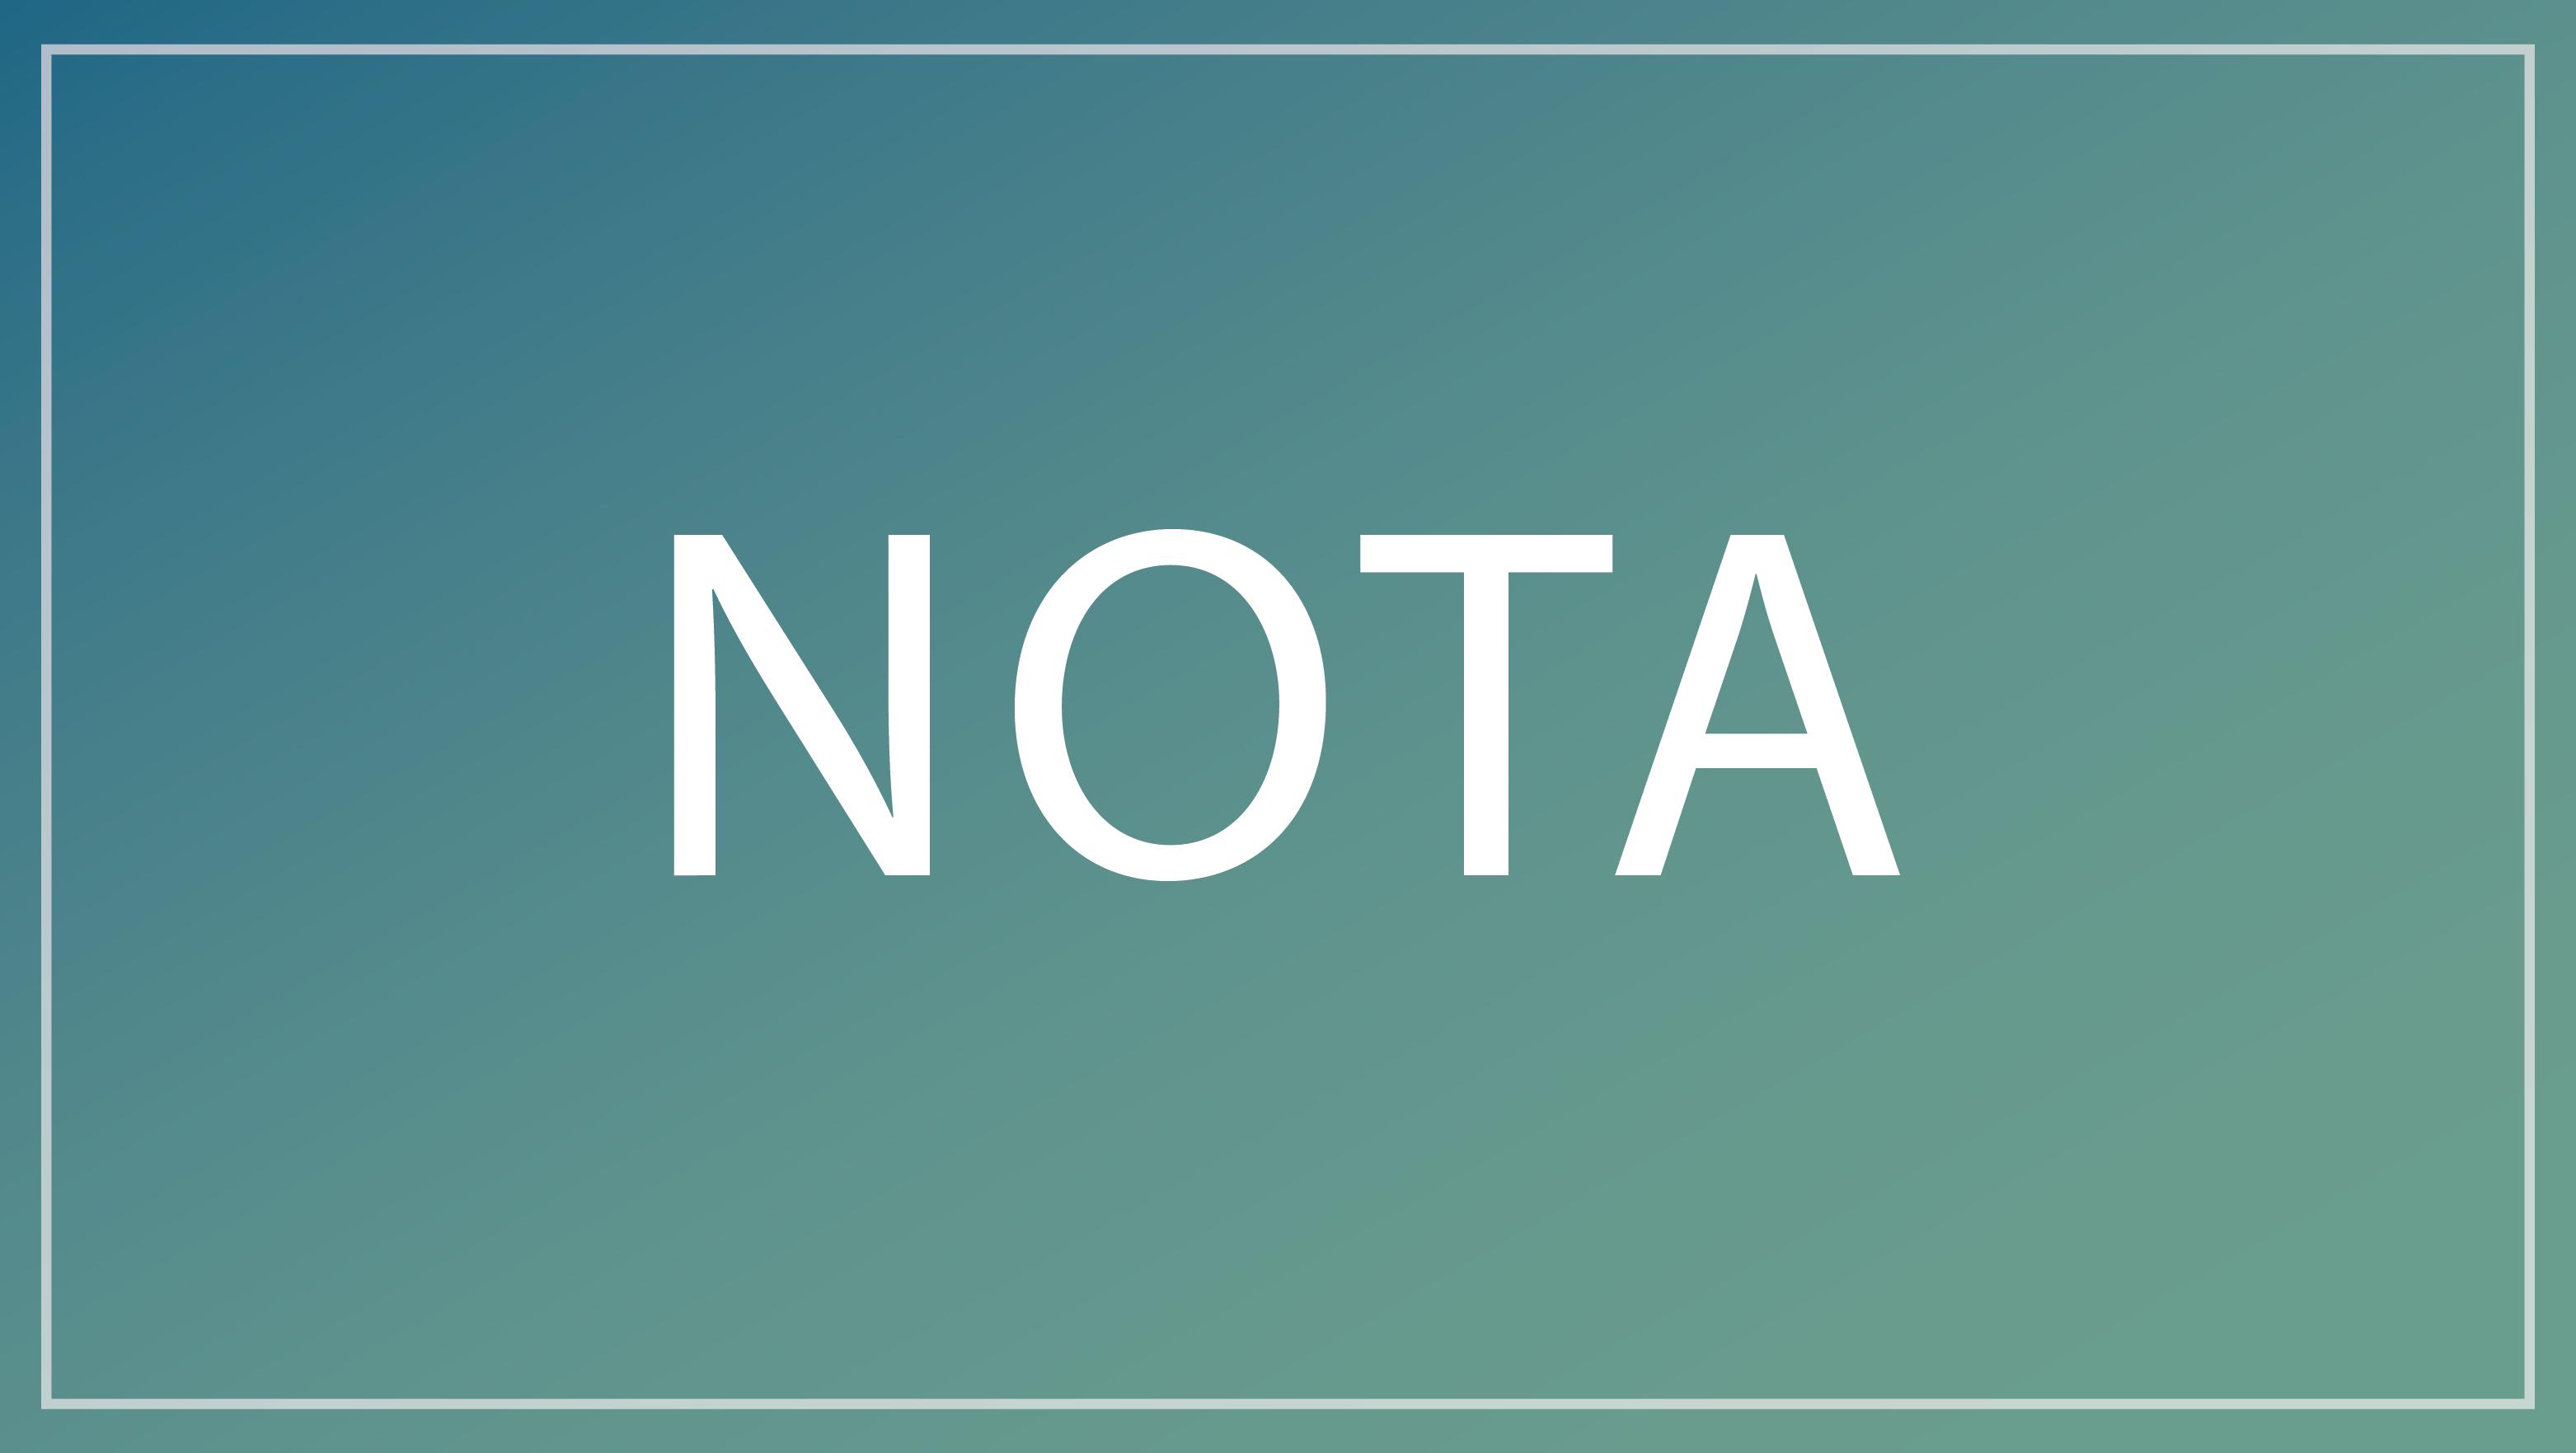 copy_of_NOTA01.jpg